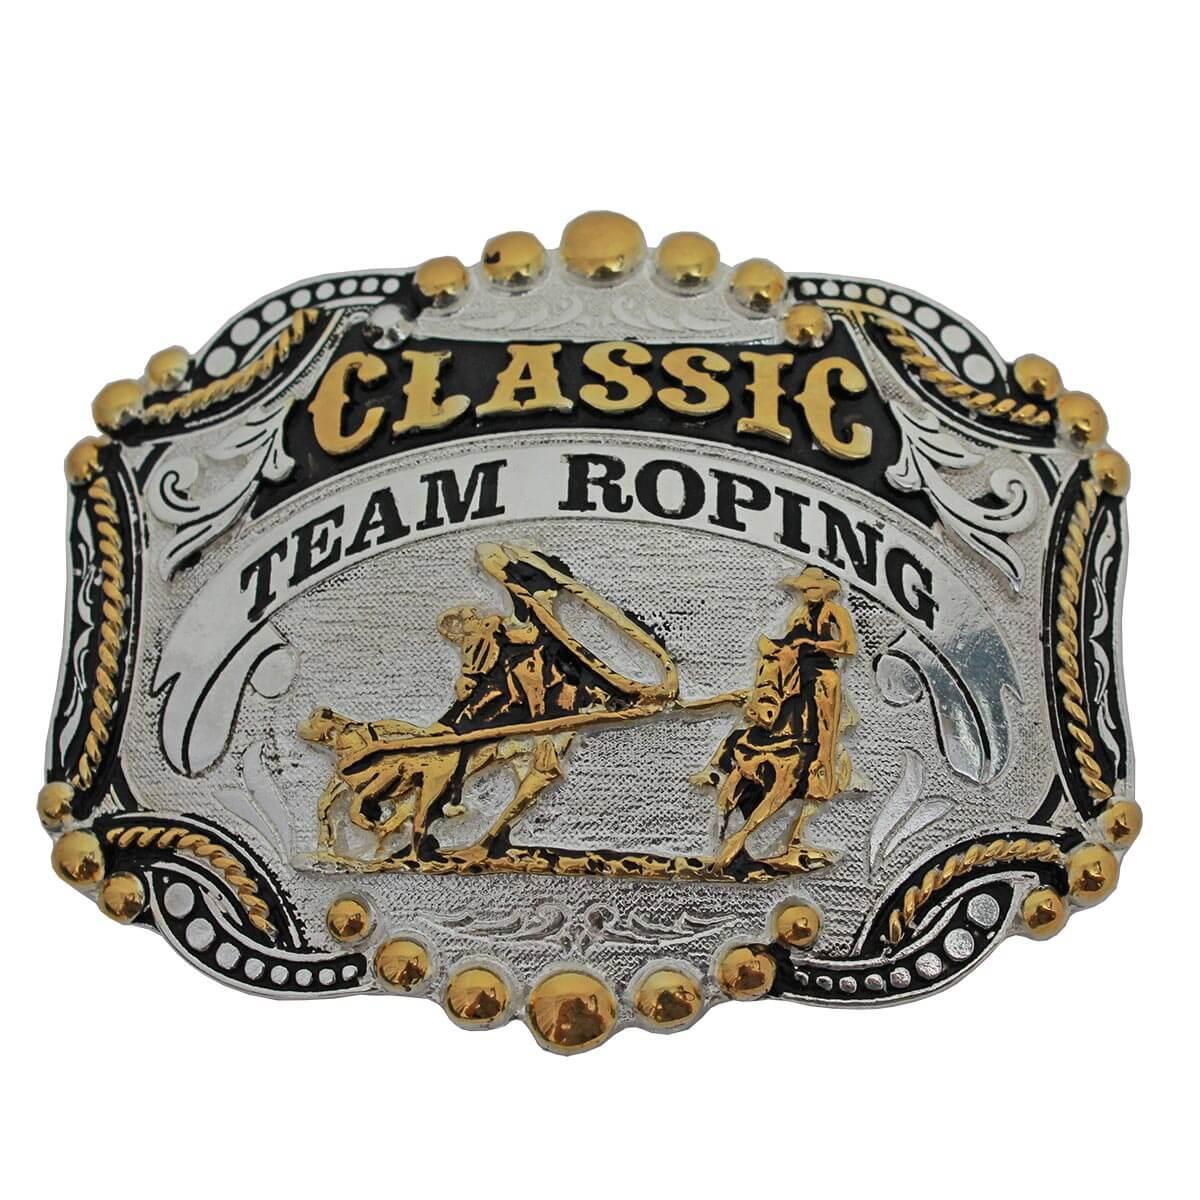 Fivela Master Western Classic Team Roping Prata